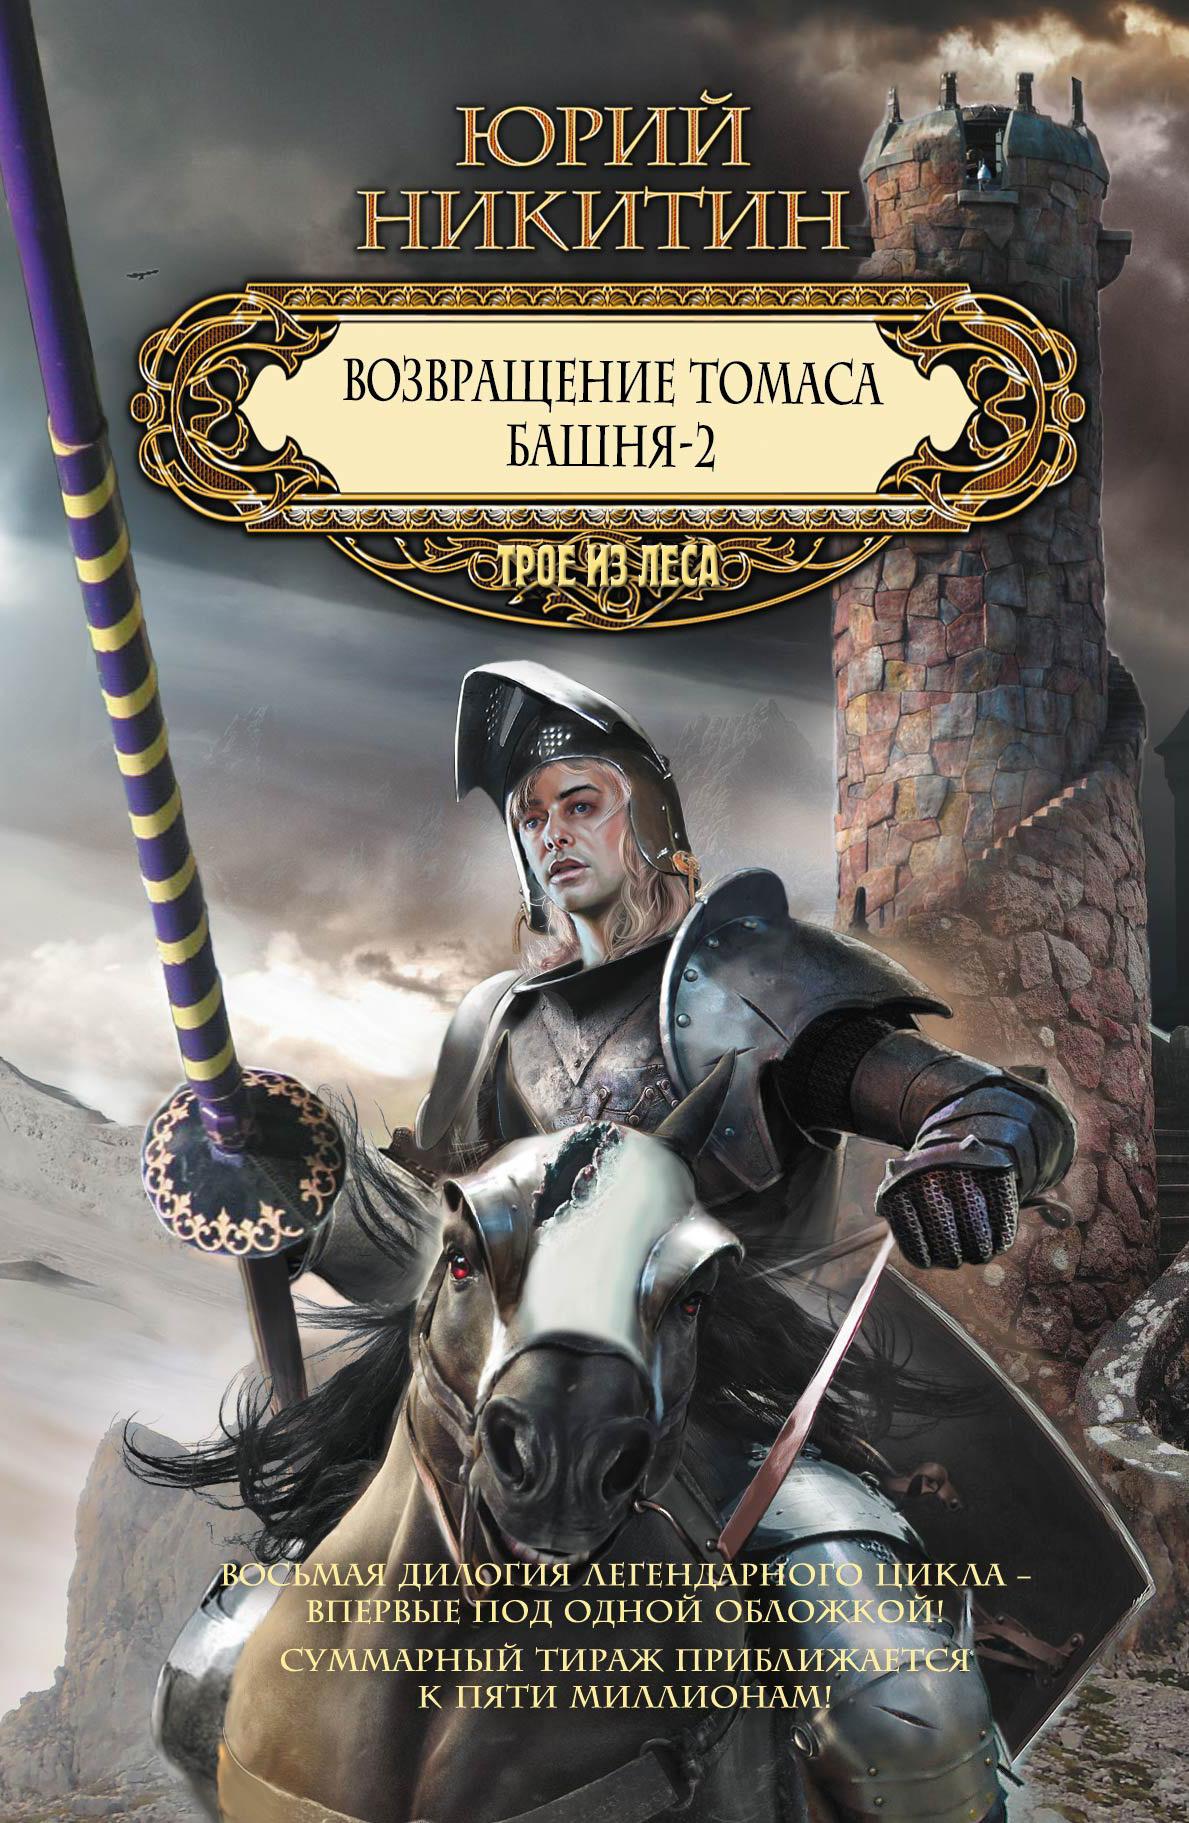 Возвращение Томаса. Башня-2 (сборник)